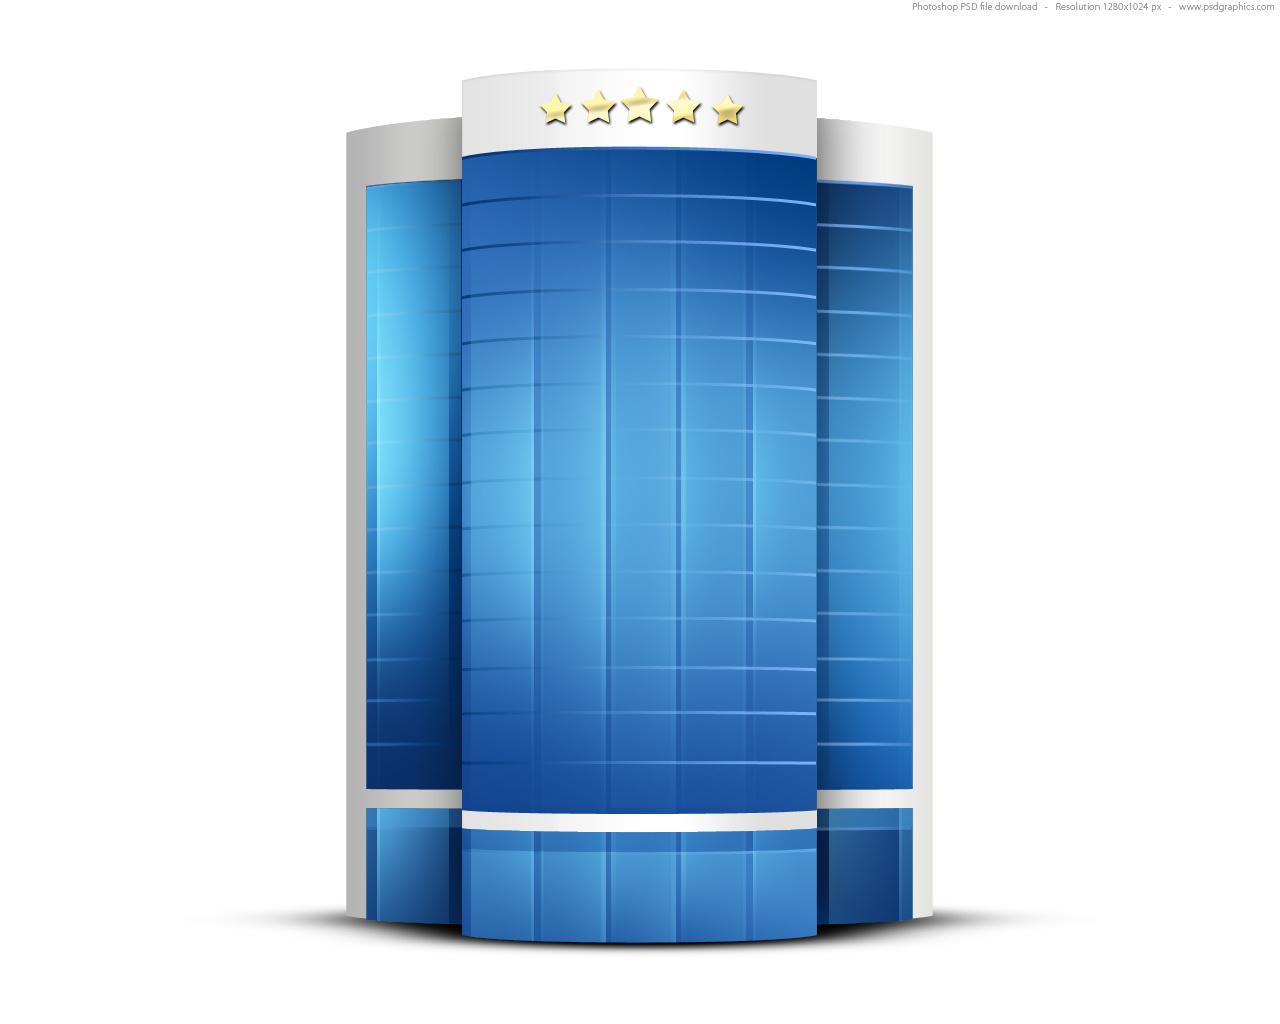 12 3D Builder Icon Images